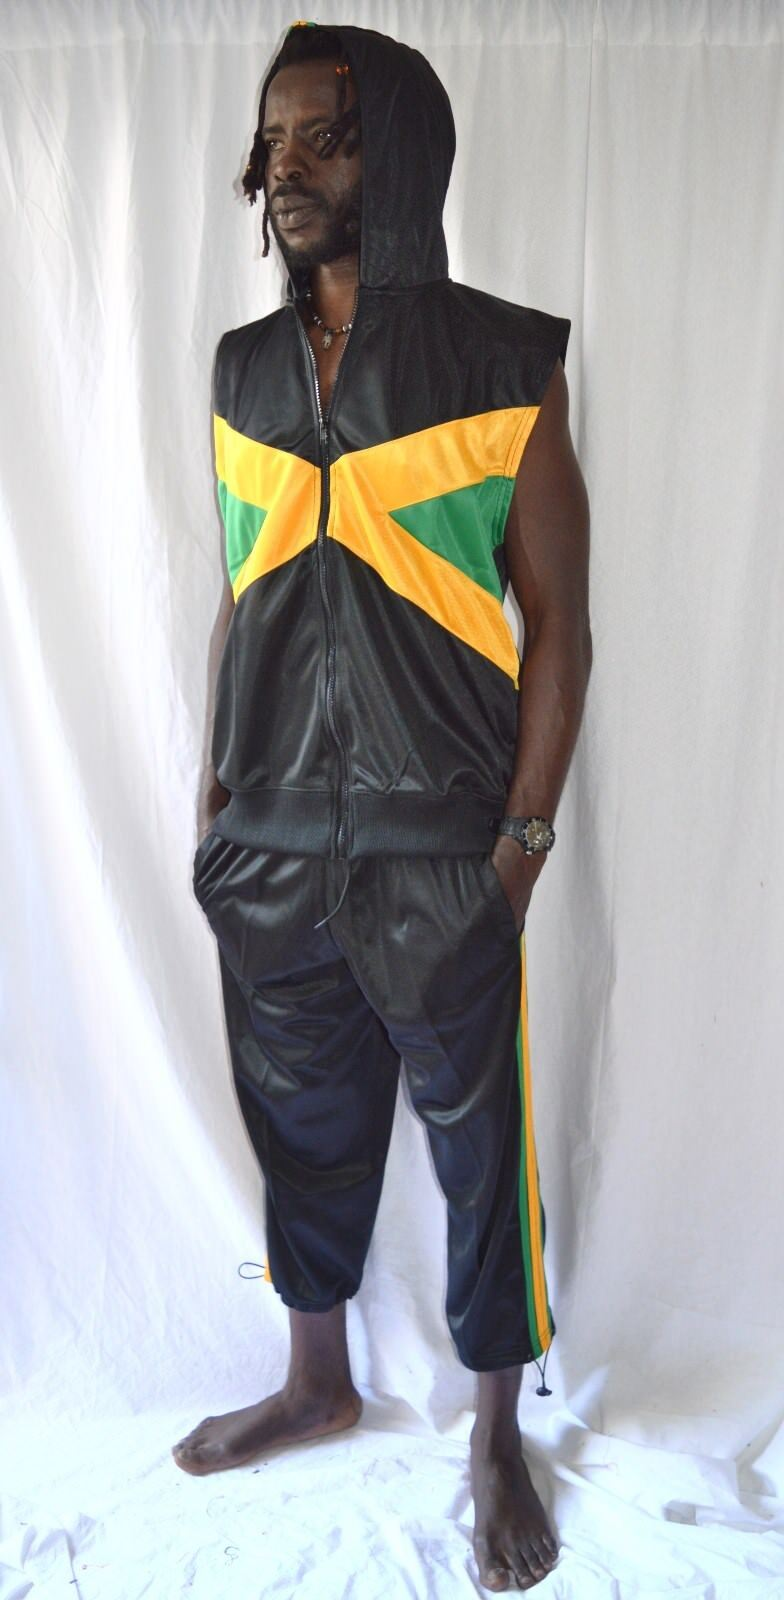 Armellose Kurarm 3 Rasta Hose_Trainer_Jamaica 4 + Jacke